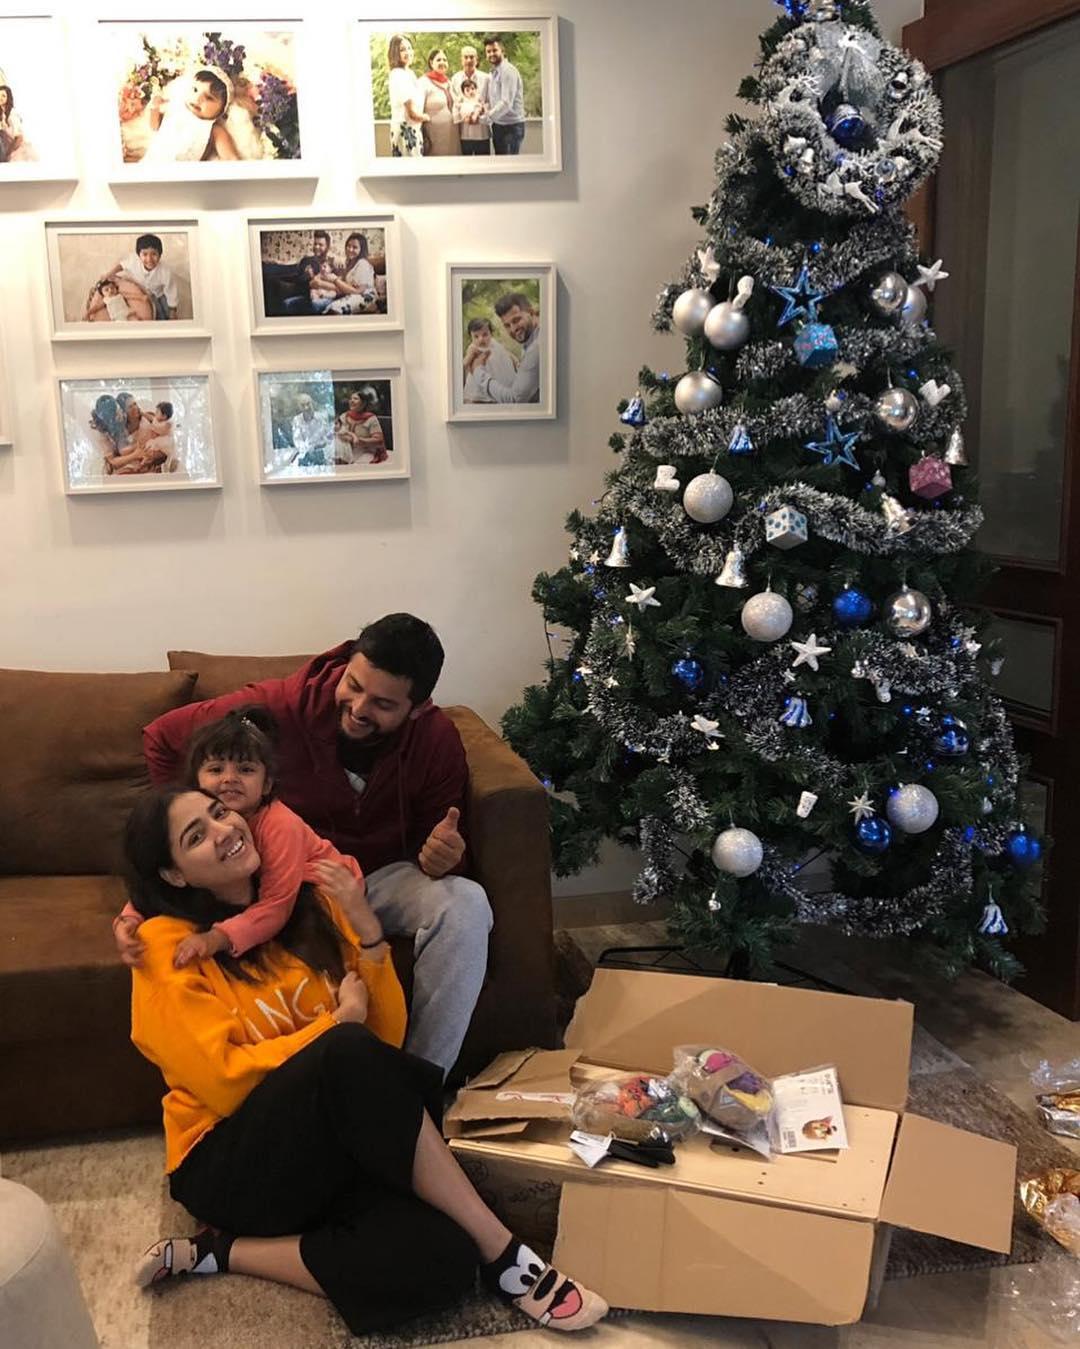 Merry Christmas: সবার সাথে সাথে ক্রিকেট বিশ্বেও পালিত হলো বড়দিন ! কিন্তু কিভাবে , দেখে নিন তার কিছু ছবি 3